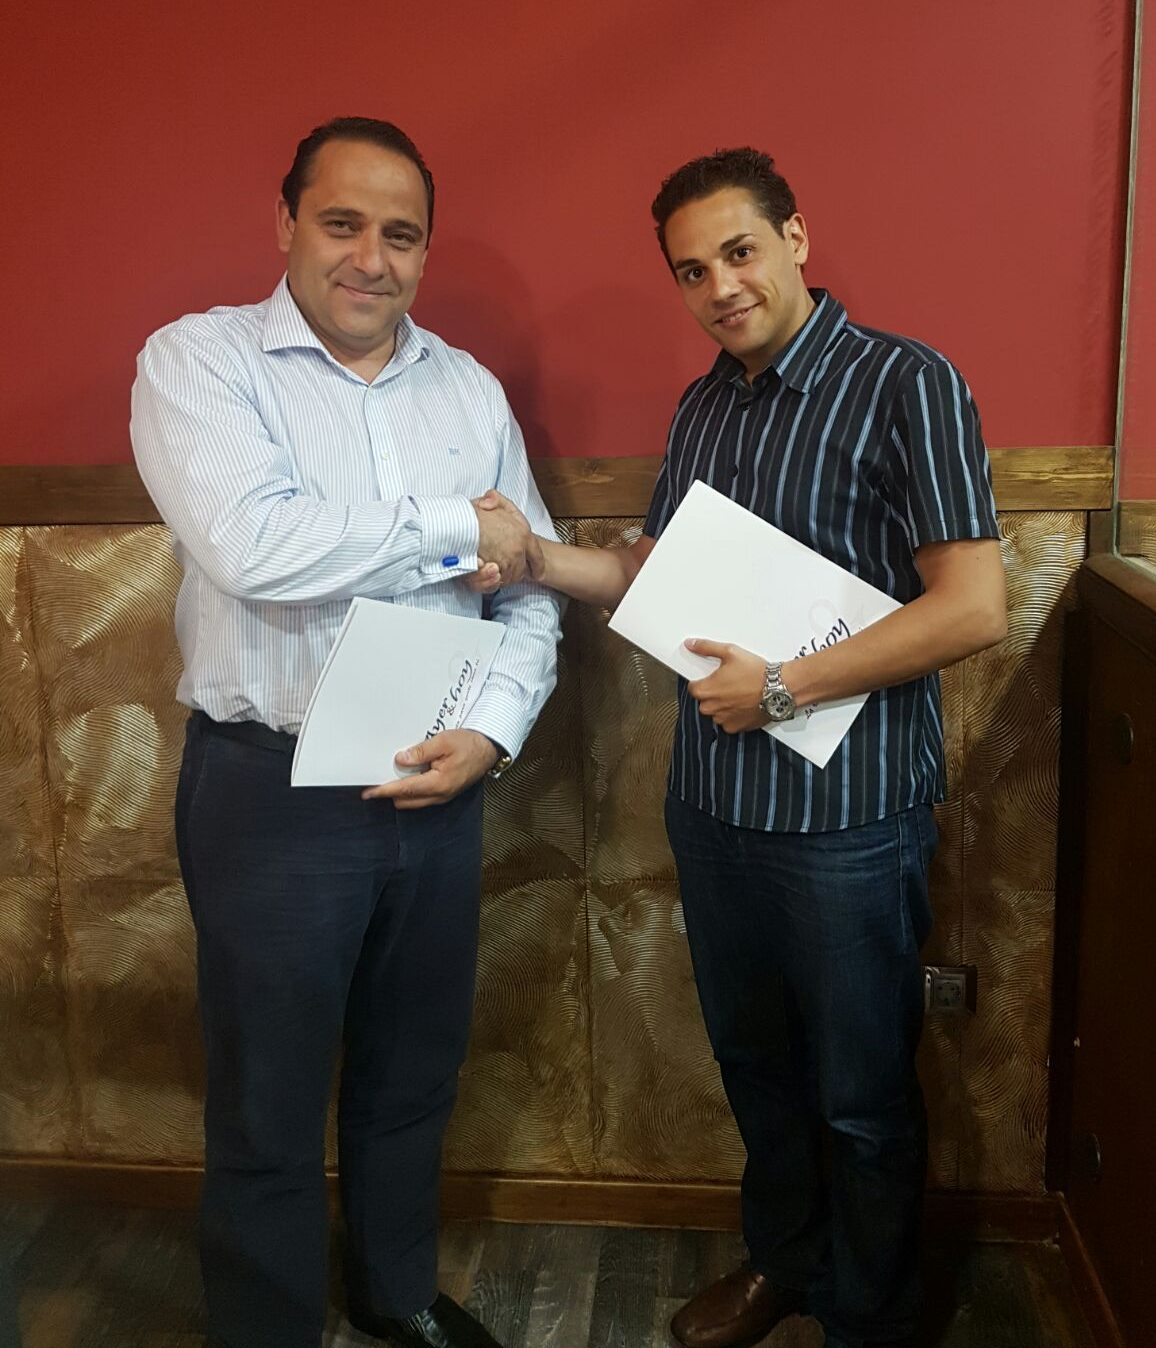 Miguel Ángel Gómez Poblete y Ramón Gil Domínguez